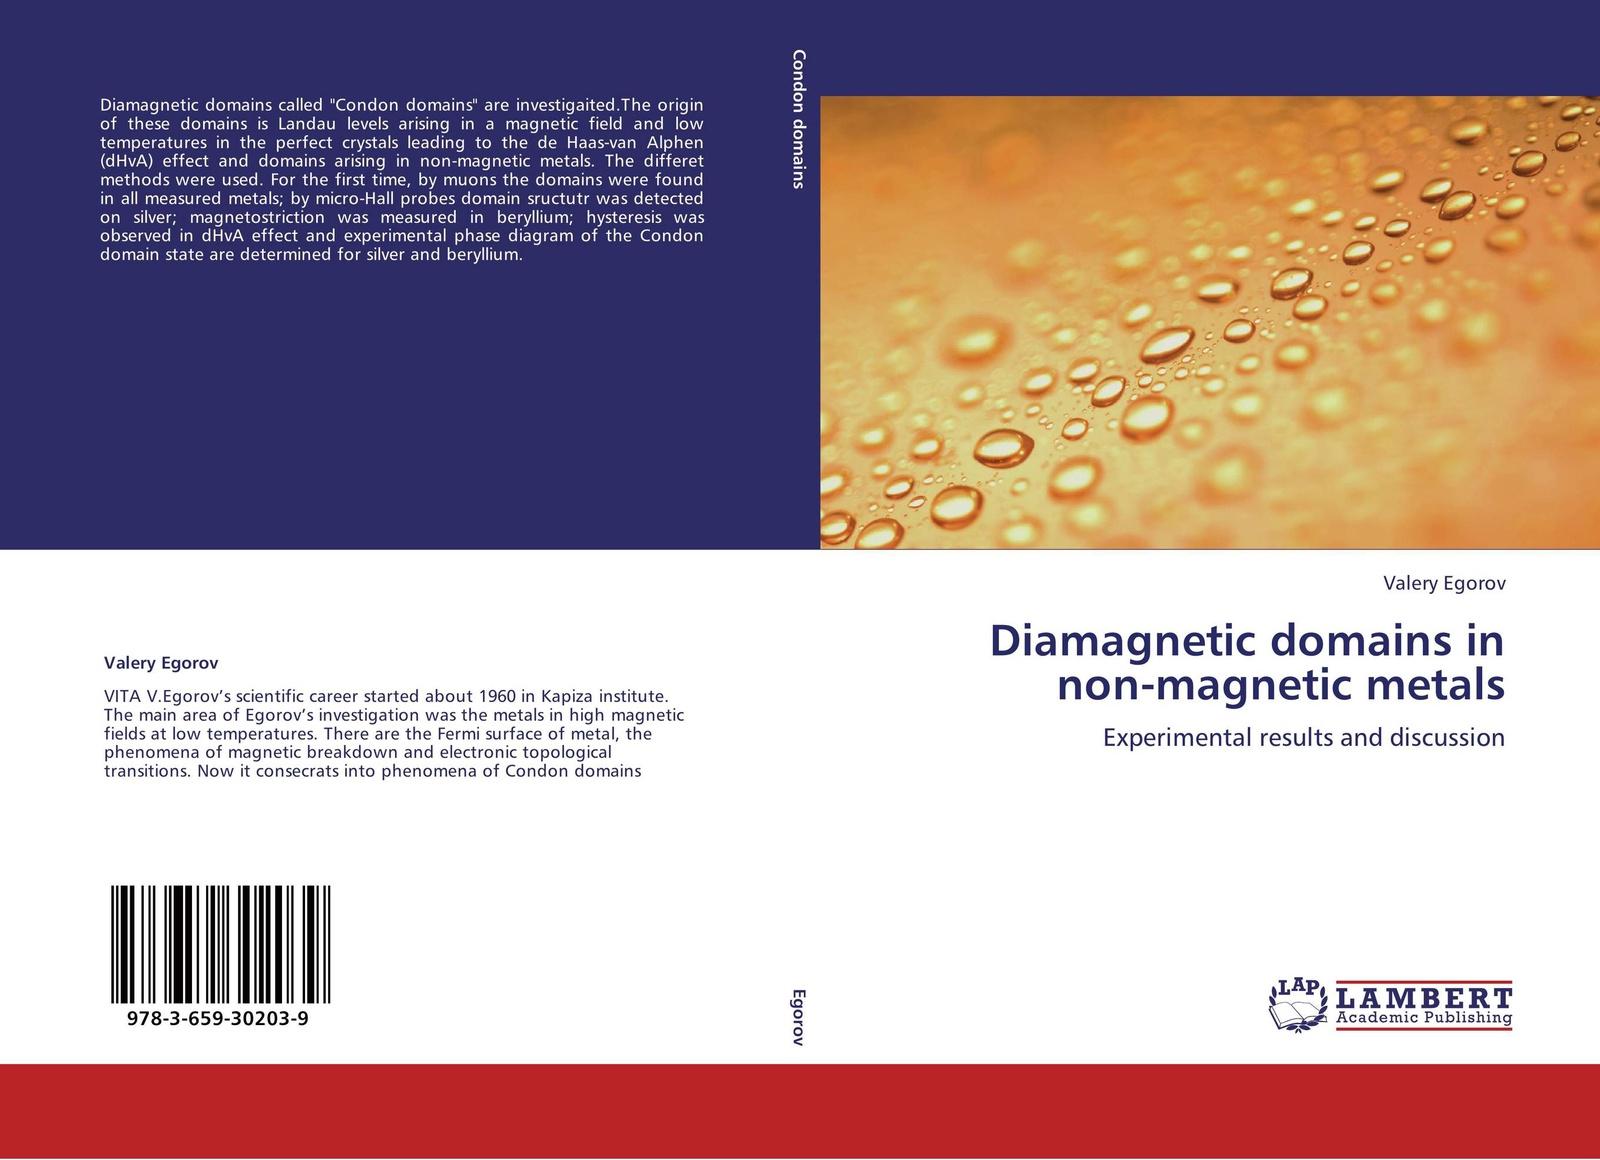 Valery Egorov Diamagnetic domains in non-magnetic metals недорого